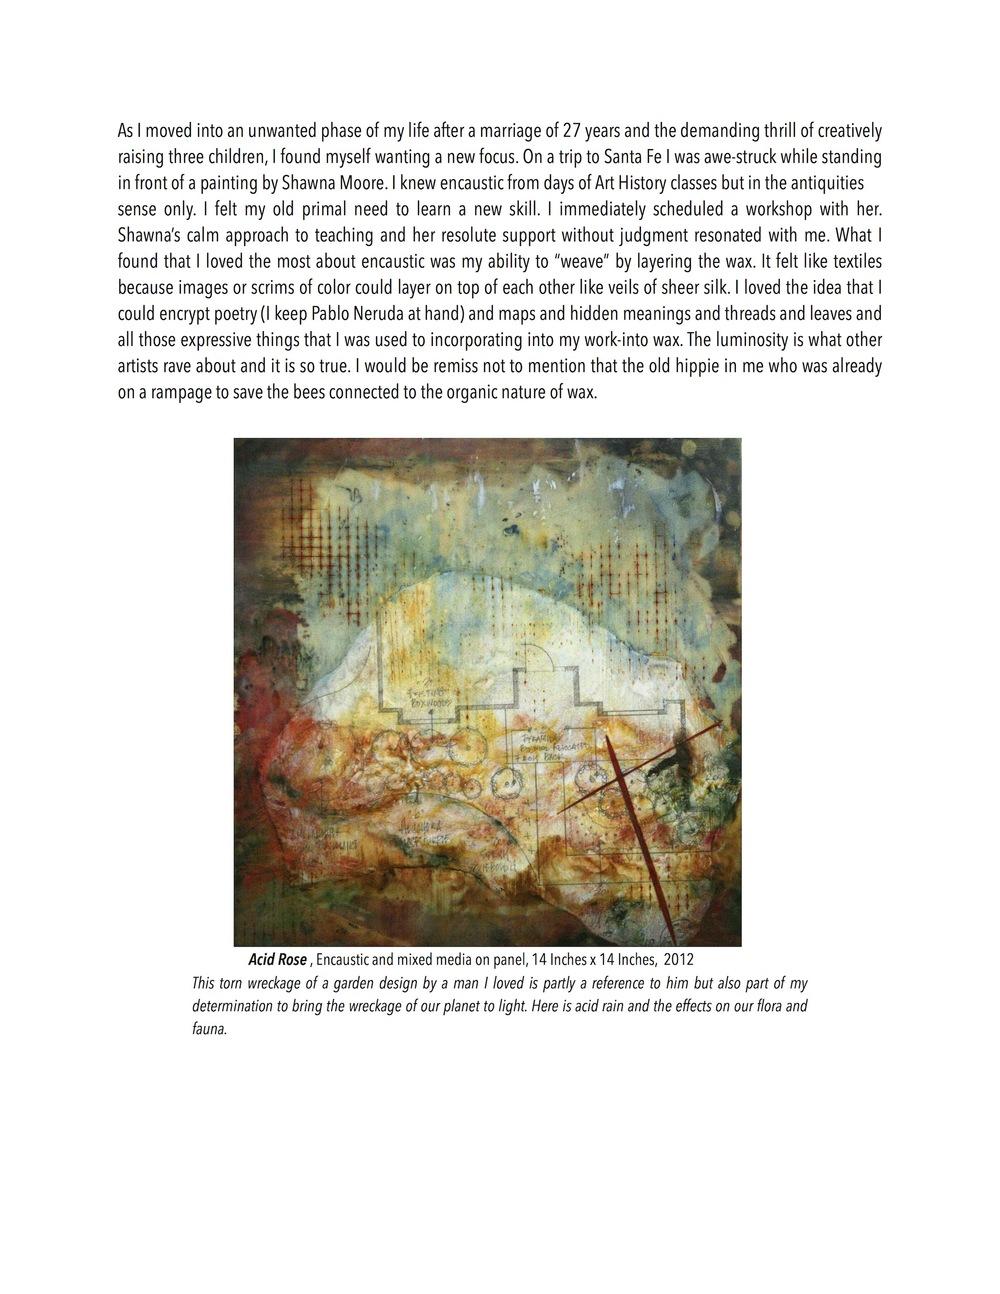 Lisa Bick - EAI Online Magazine - Artist Statement - June 2015-p4.jpg